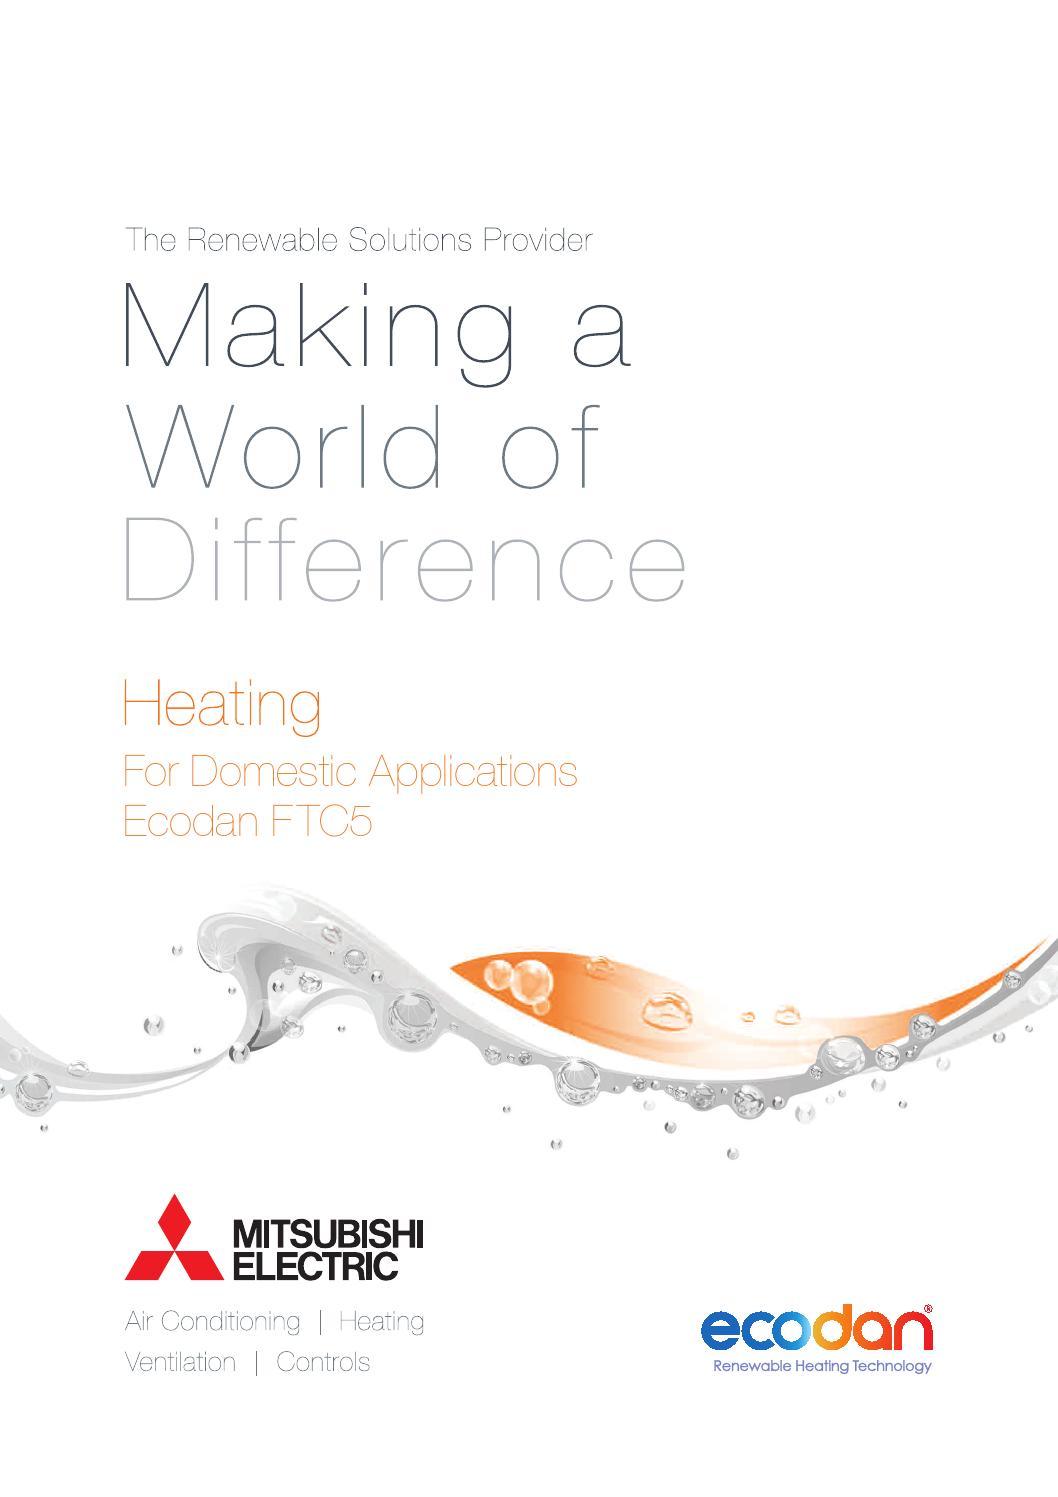 mitsubishi ecodan heat pump domestic heating brochure by